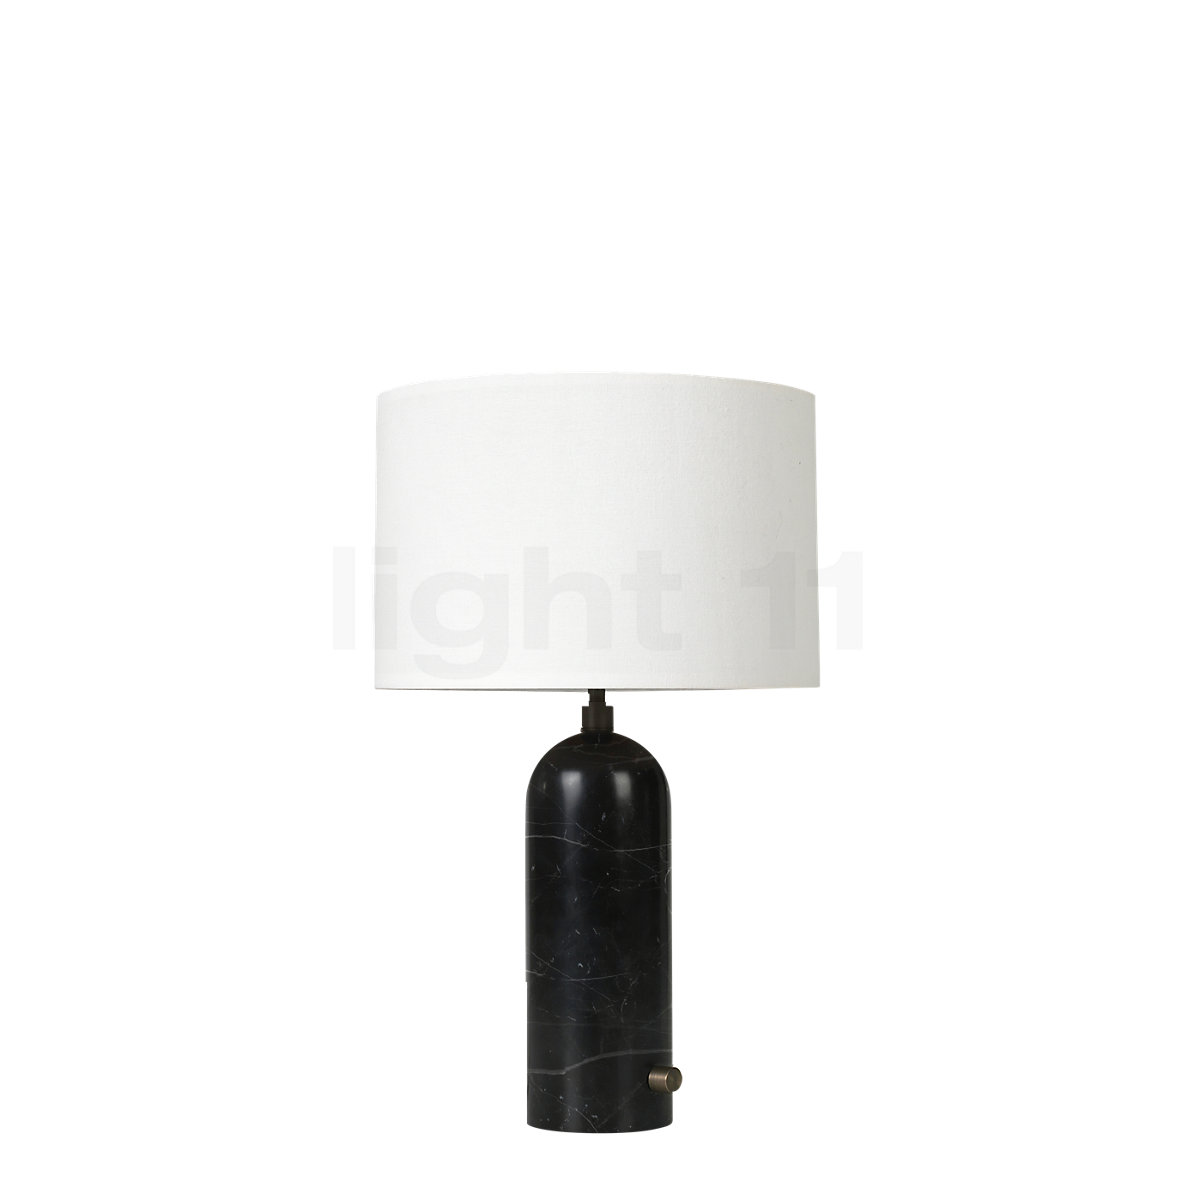 Buy Gubi Gravity Table Lamp Small At Light11 Eu